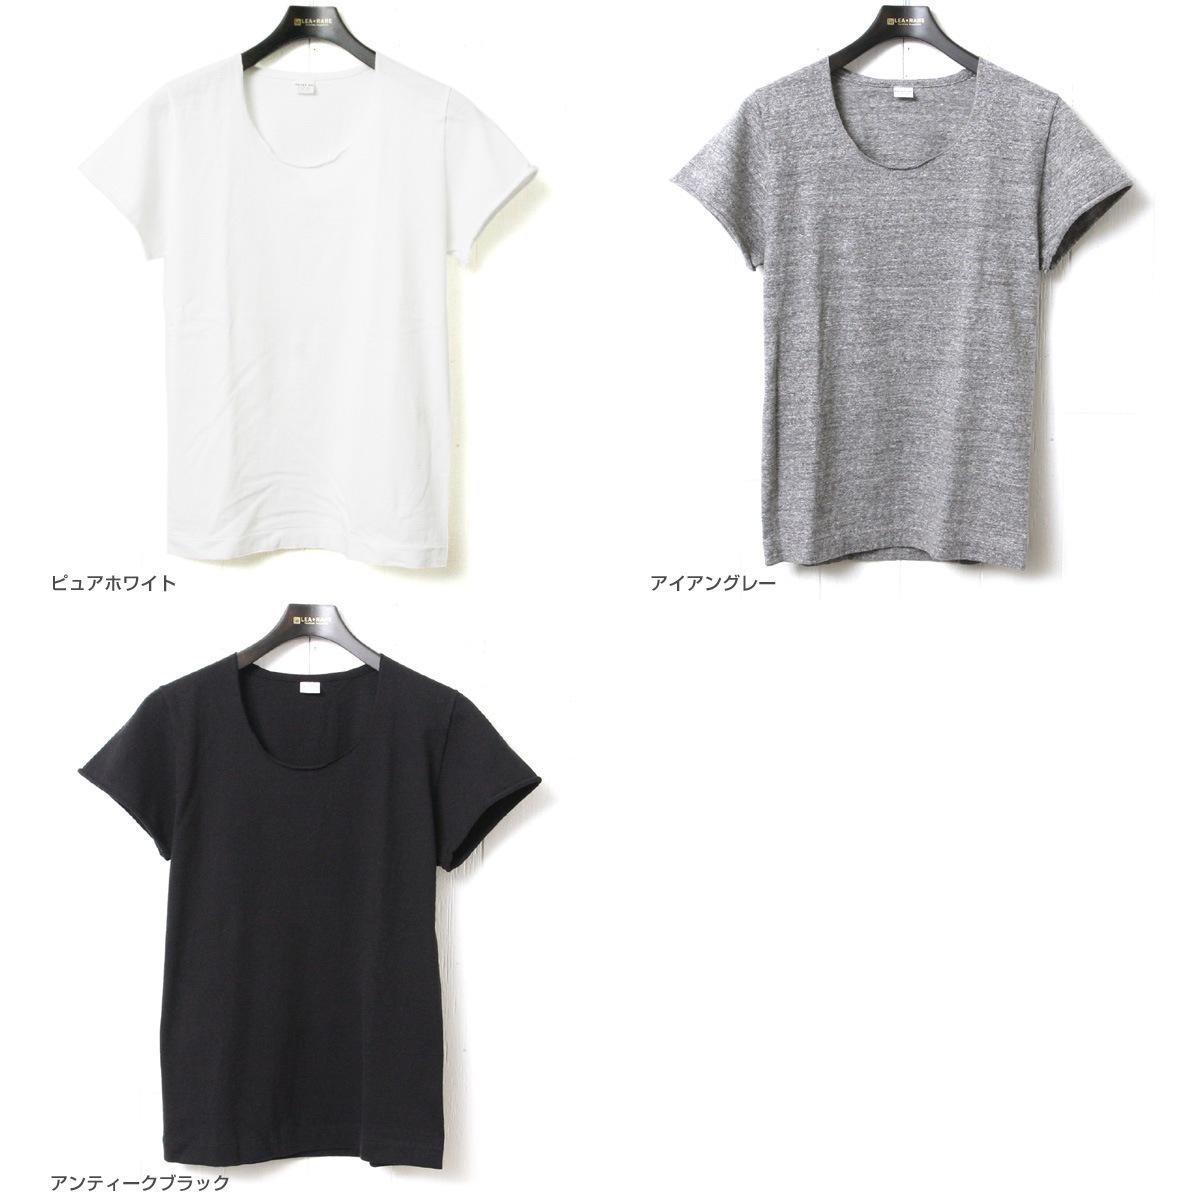 ENTRY SG エントリーSG GIG MODEL ギグモデル カットオフTシャツ